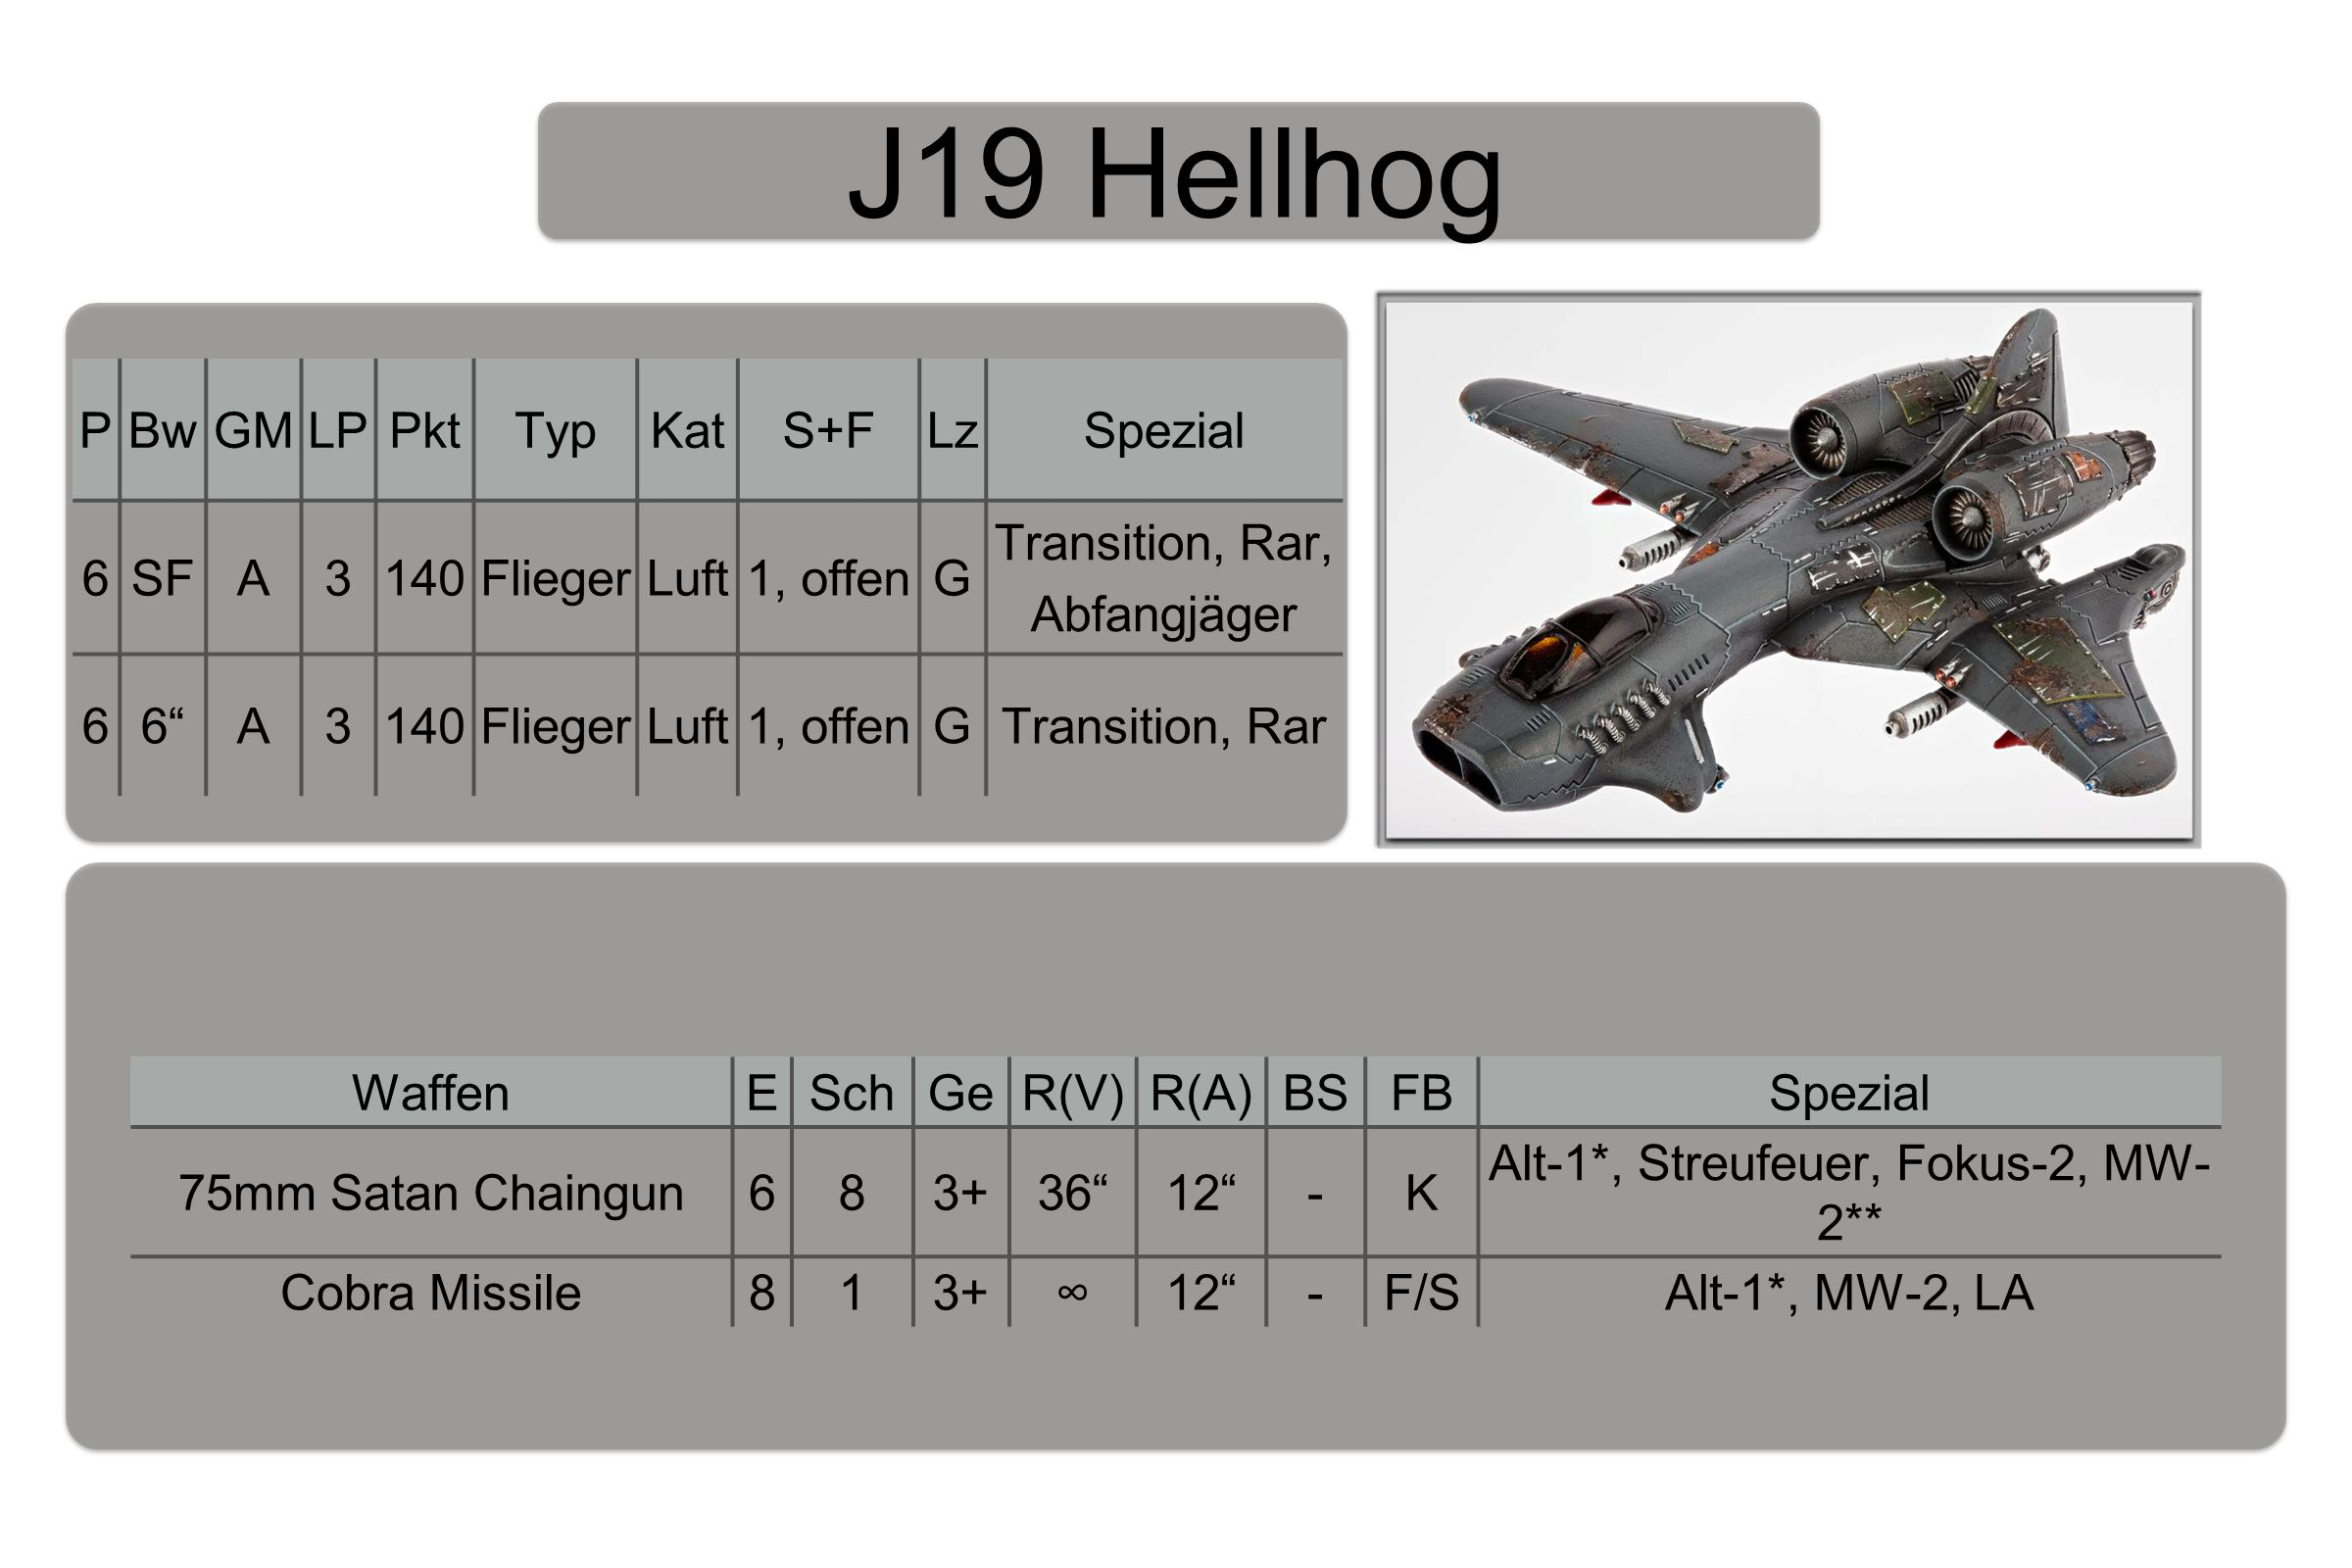 J19 Hellhog PBwGMLPPktTypKatS+FLzSpezial 6SFA3140FliegerLuft1, offenG Transition, Rar, Abfangjäger 66 A3140FliegerLuft1, offenGTransition, Rar WaffenESchGeR(V)R(A)BSFBSpezial 75mm Satan Chaingun683+36 12 -K Alt-1*, Streufeuer, Fokus-2, MW- 2** Cobra Missile813+∞12 -F/SAlt-1*, MW-2, LA